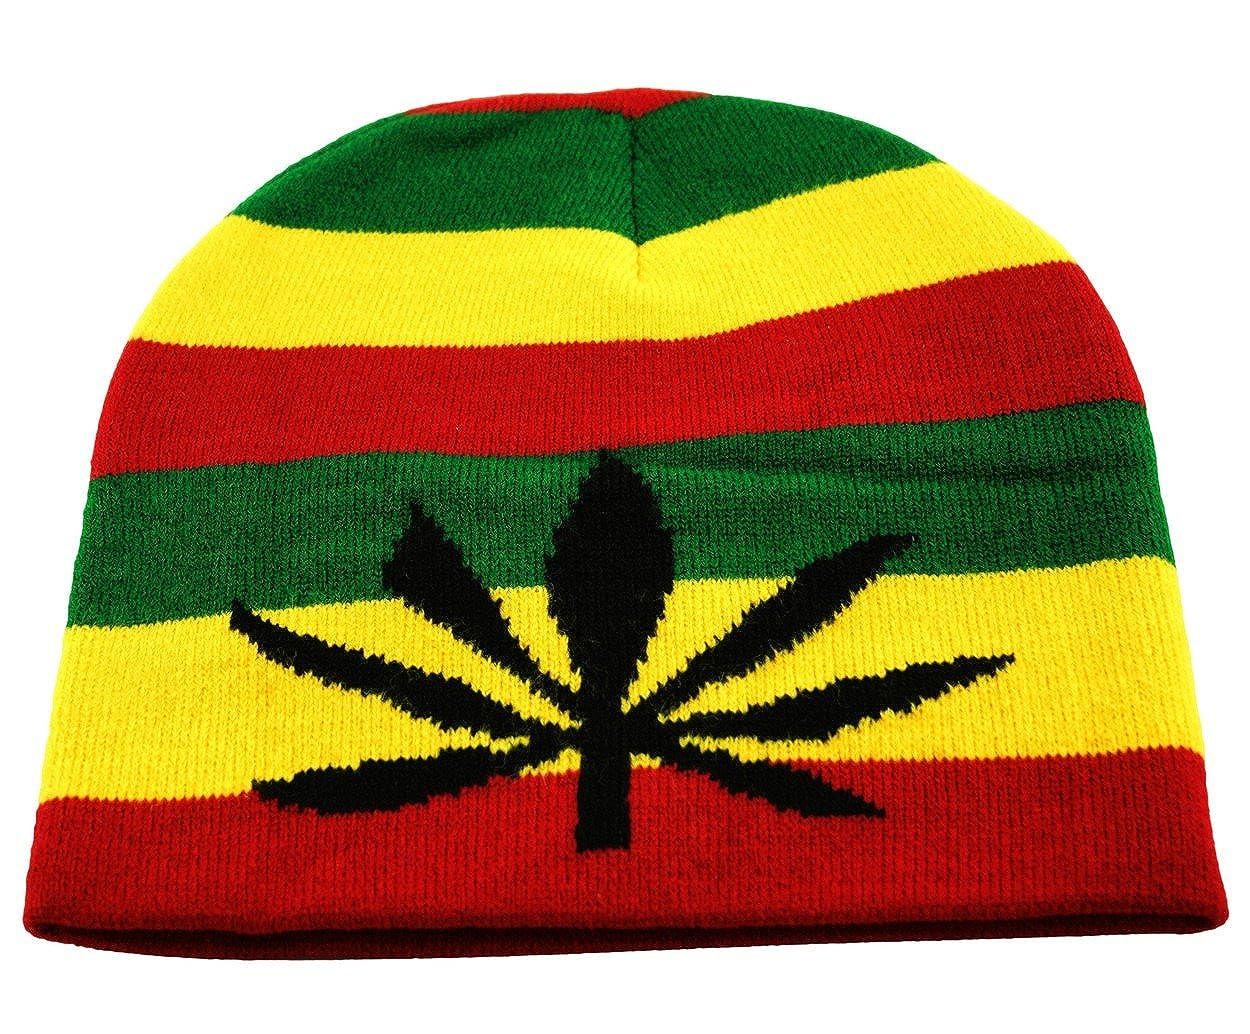 722850791 Rasta Skully Beanie Knit Hat Cap Weed Ganja Leaf in Black Red Yellow Green